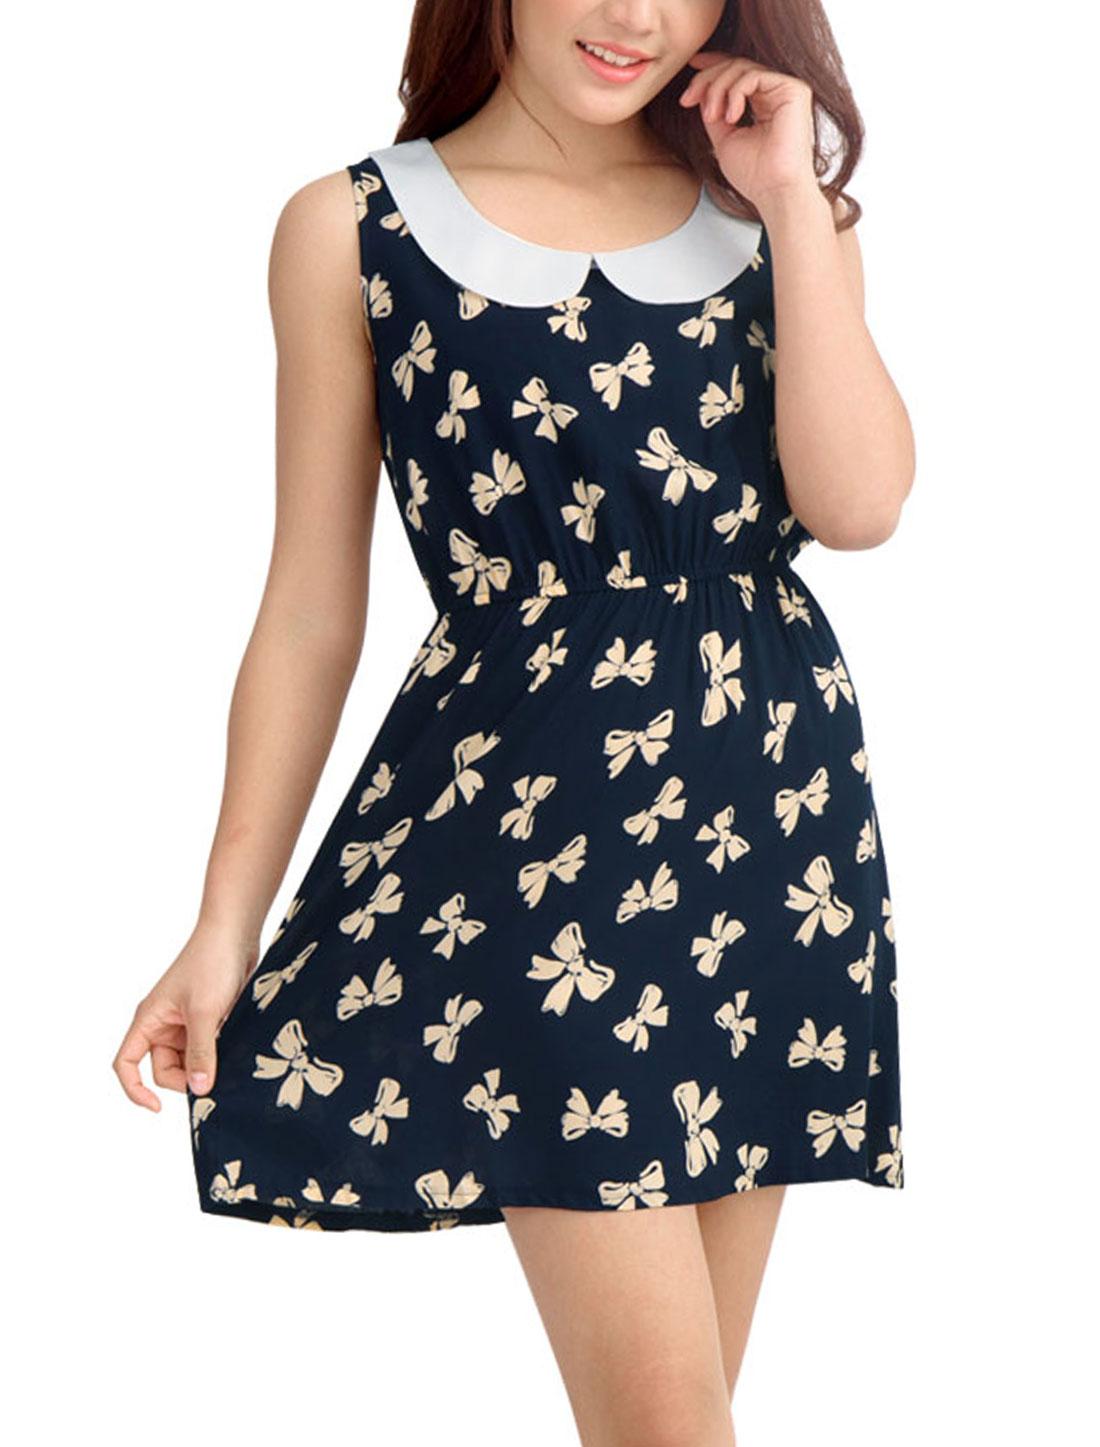 Women Stretchy Waist Bowknot Pattern Sweet Tank Dress Dark Blue M